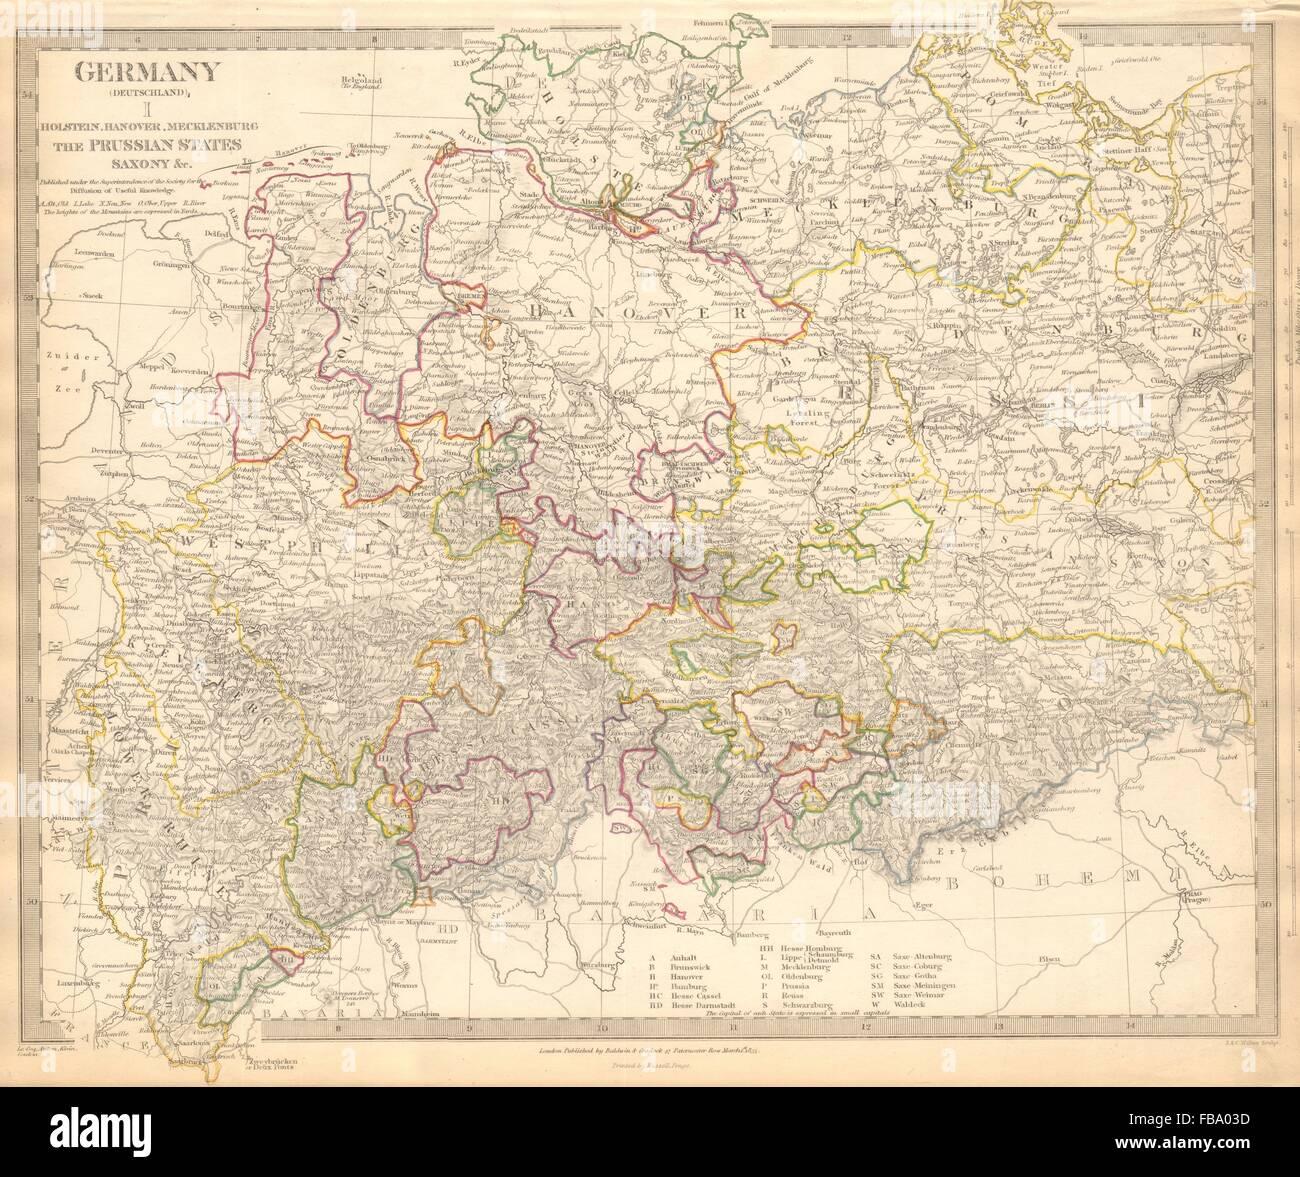 alemania deutschlandde hanver holstein mecklenburg prusia sajoniasduk 1844 mapa